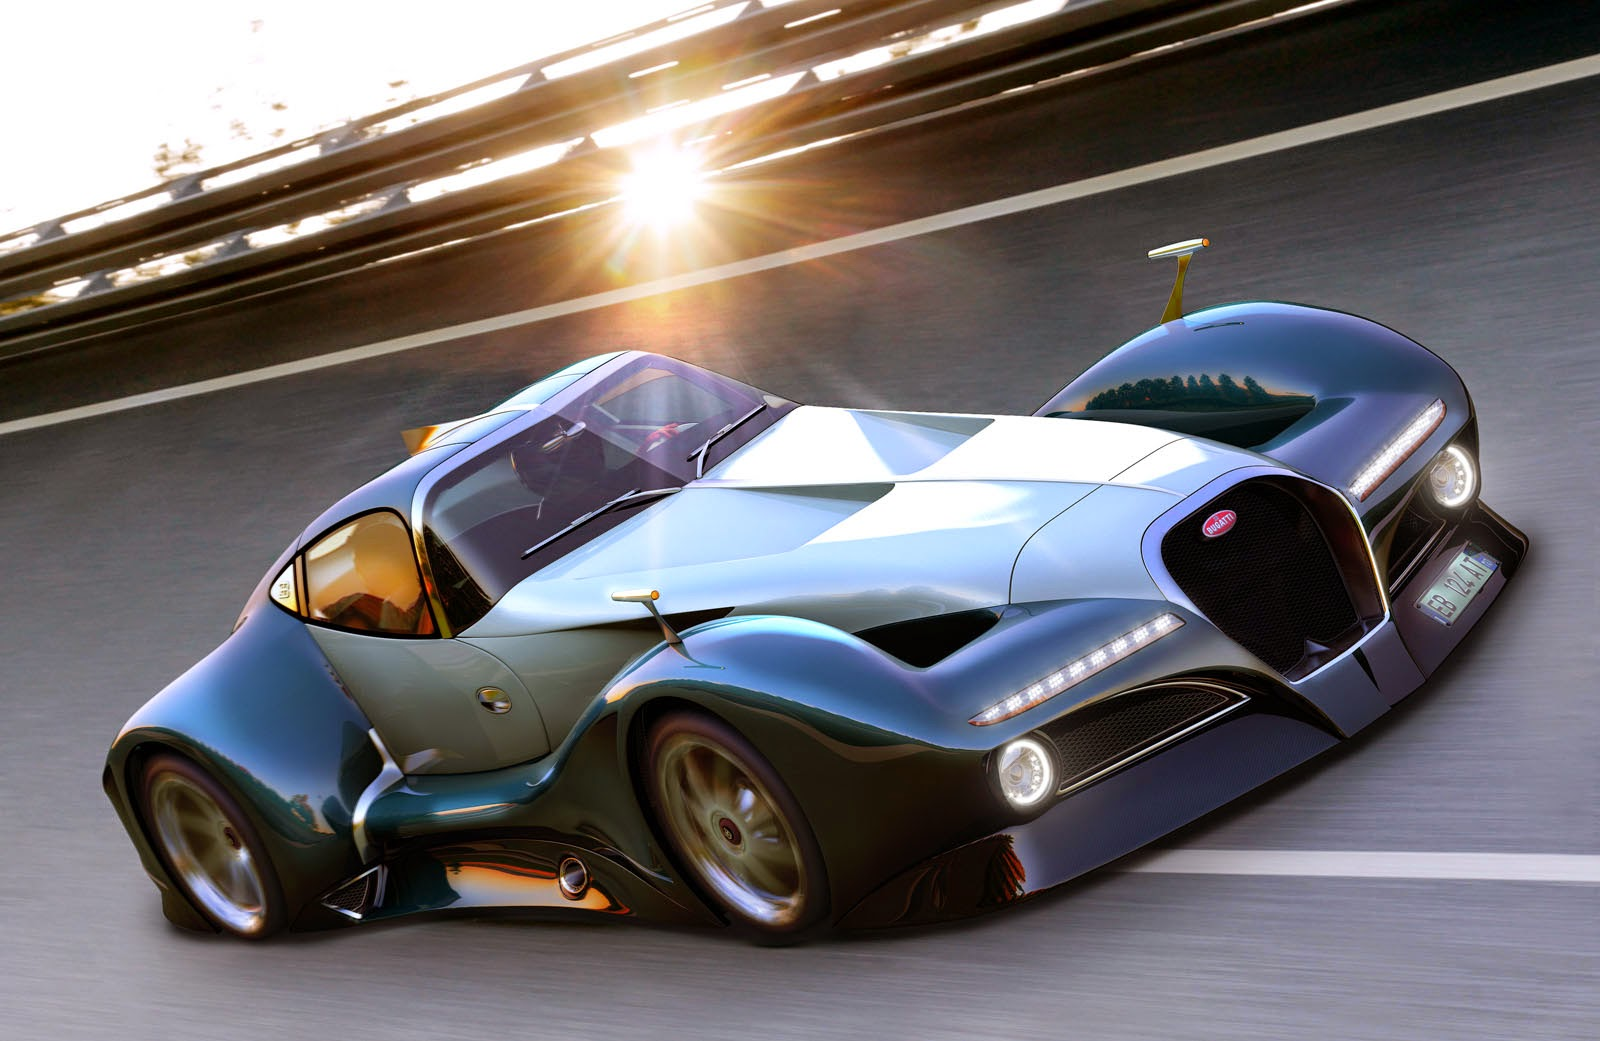 Car News 2014 Why The Bugatti Car Into The Best Modern 2014